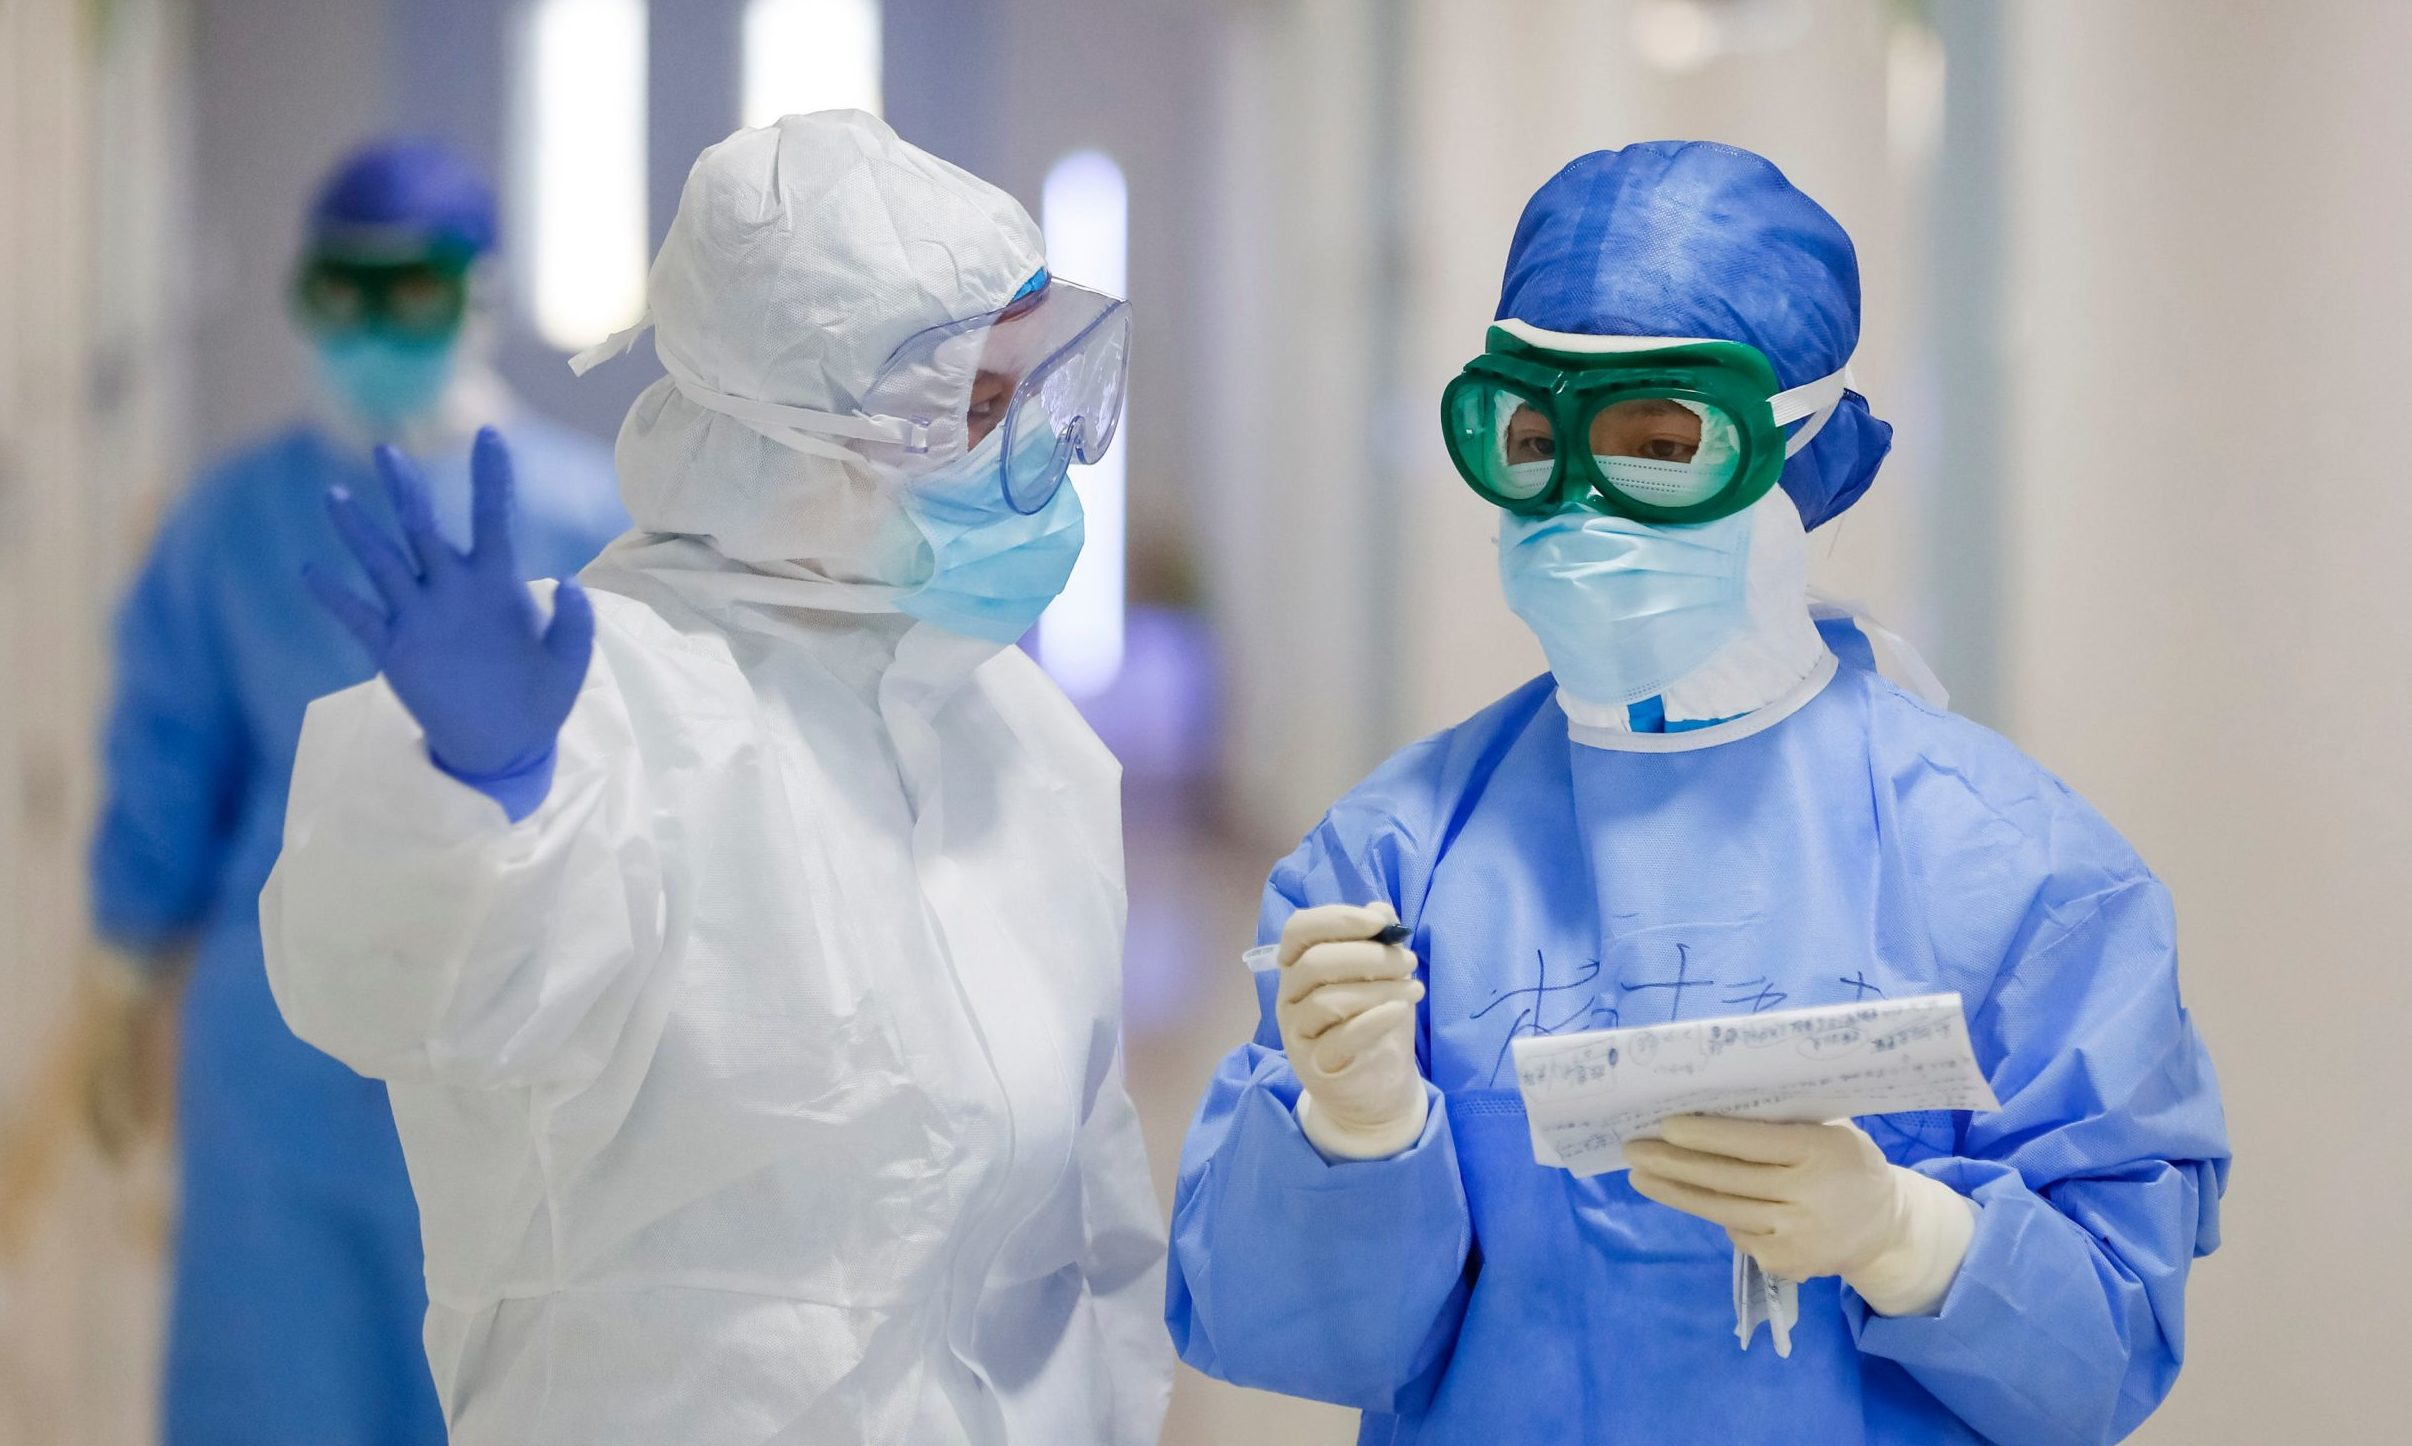 Nurses on the frontline of the original coronavirus outbreak in Wuhan, China.